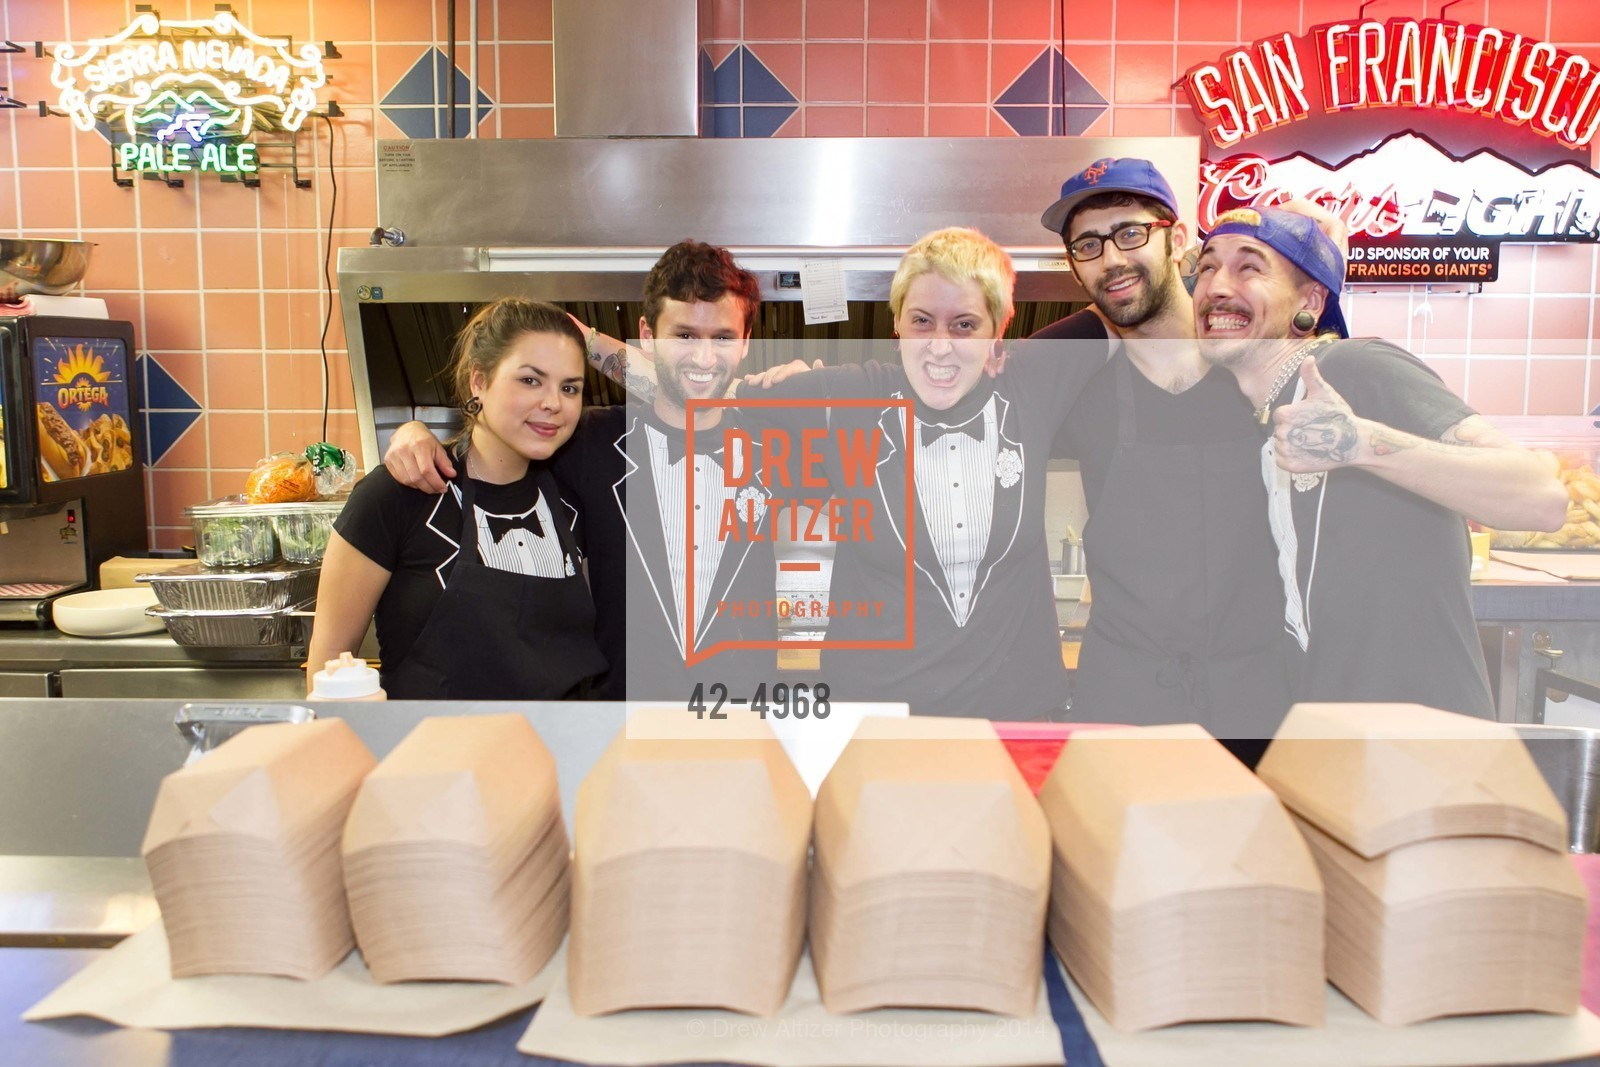 Alex Naval, Zak Silverman, Liz Endicott, Mike Thurnaver, Kyle Hord, Photo #42-4968